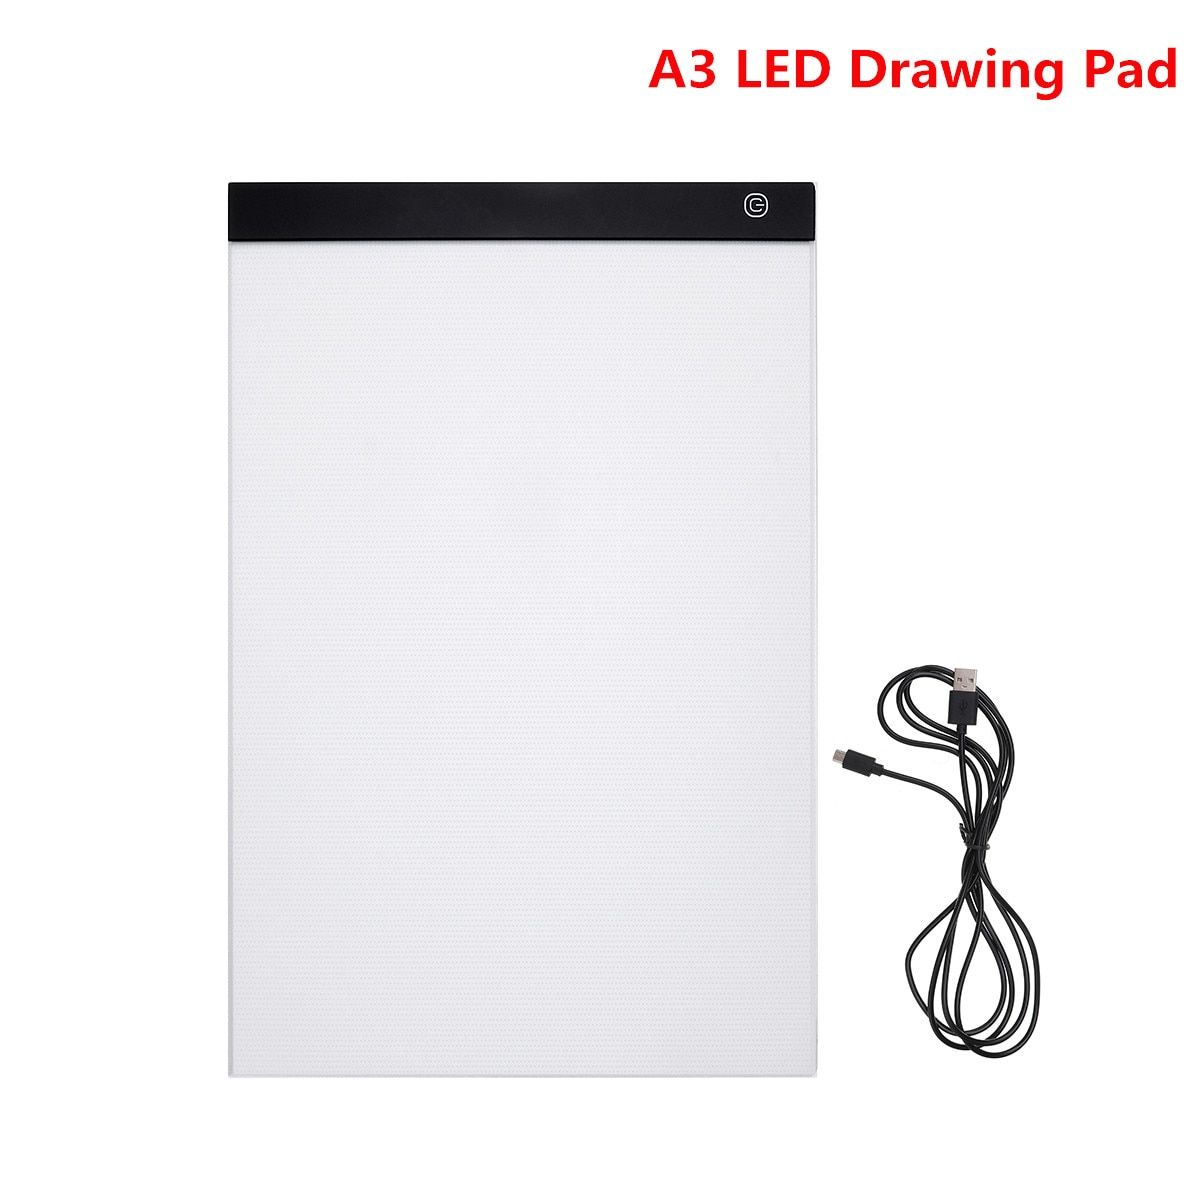 Tablet Drawing Pad A3 LED Drawing Pad Box Board Drawing Tracing Tracer Copy Board Table Pad Led Light Pad Copy Board Stencil